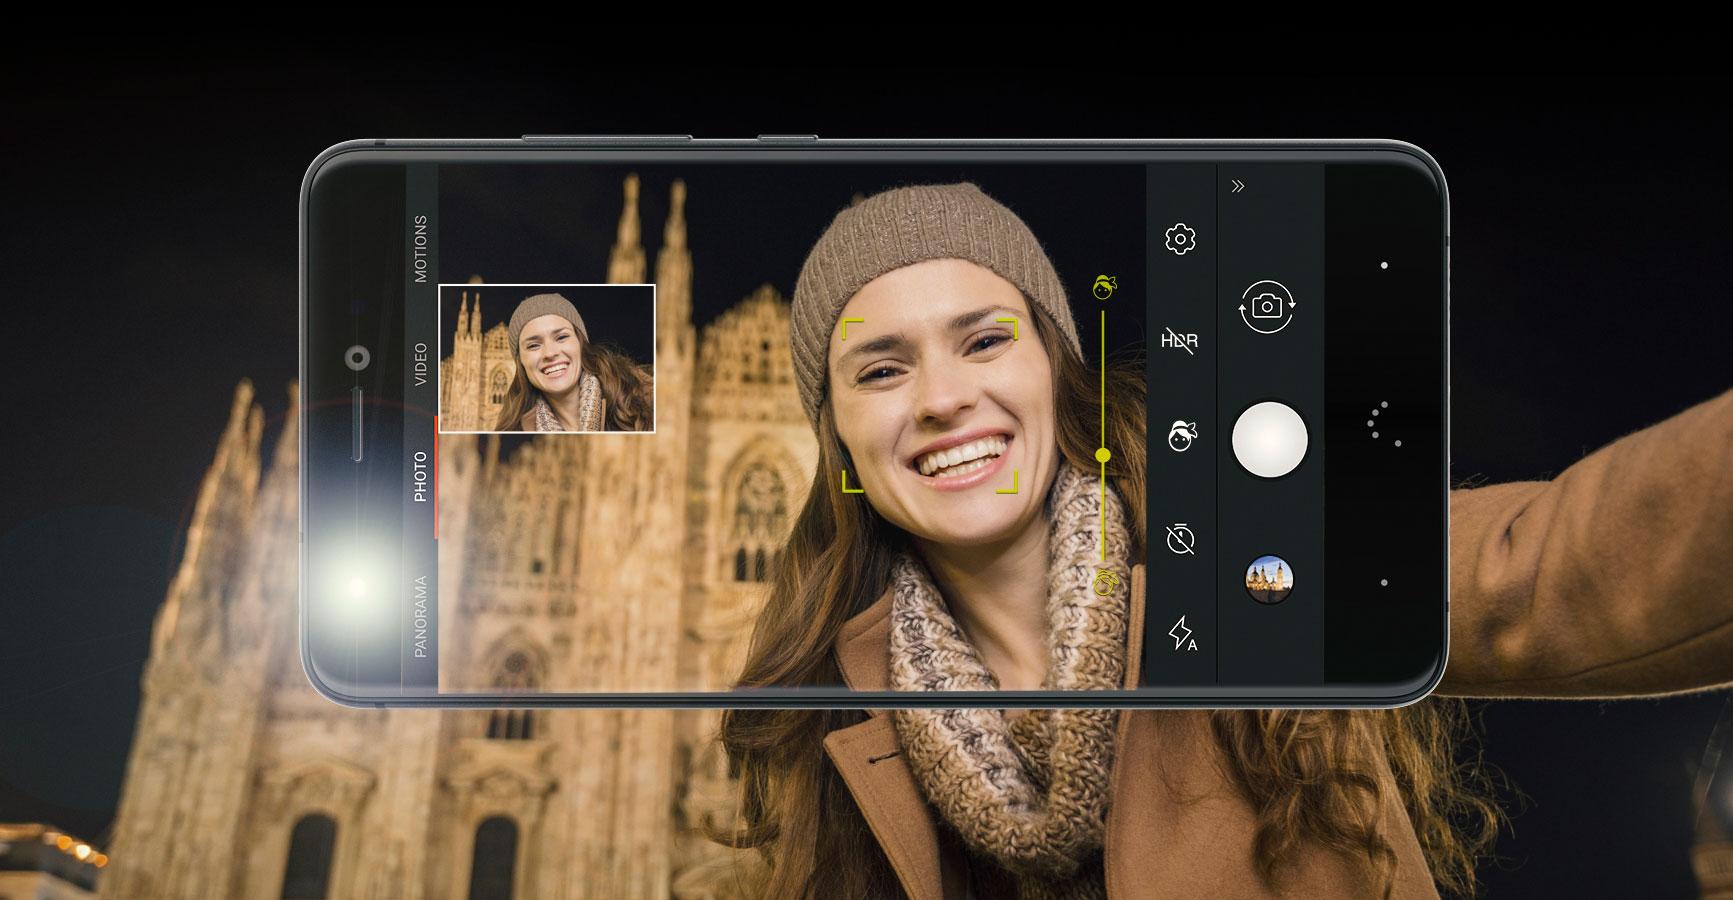 BQ Aquaris X Pro: Das Kamera-Smartphone schlechthin zum fairen Preis